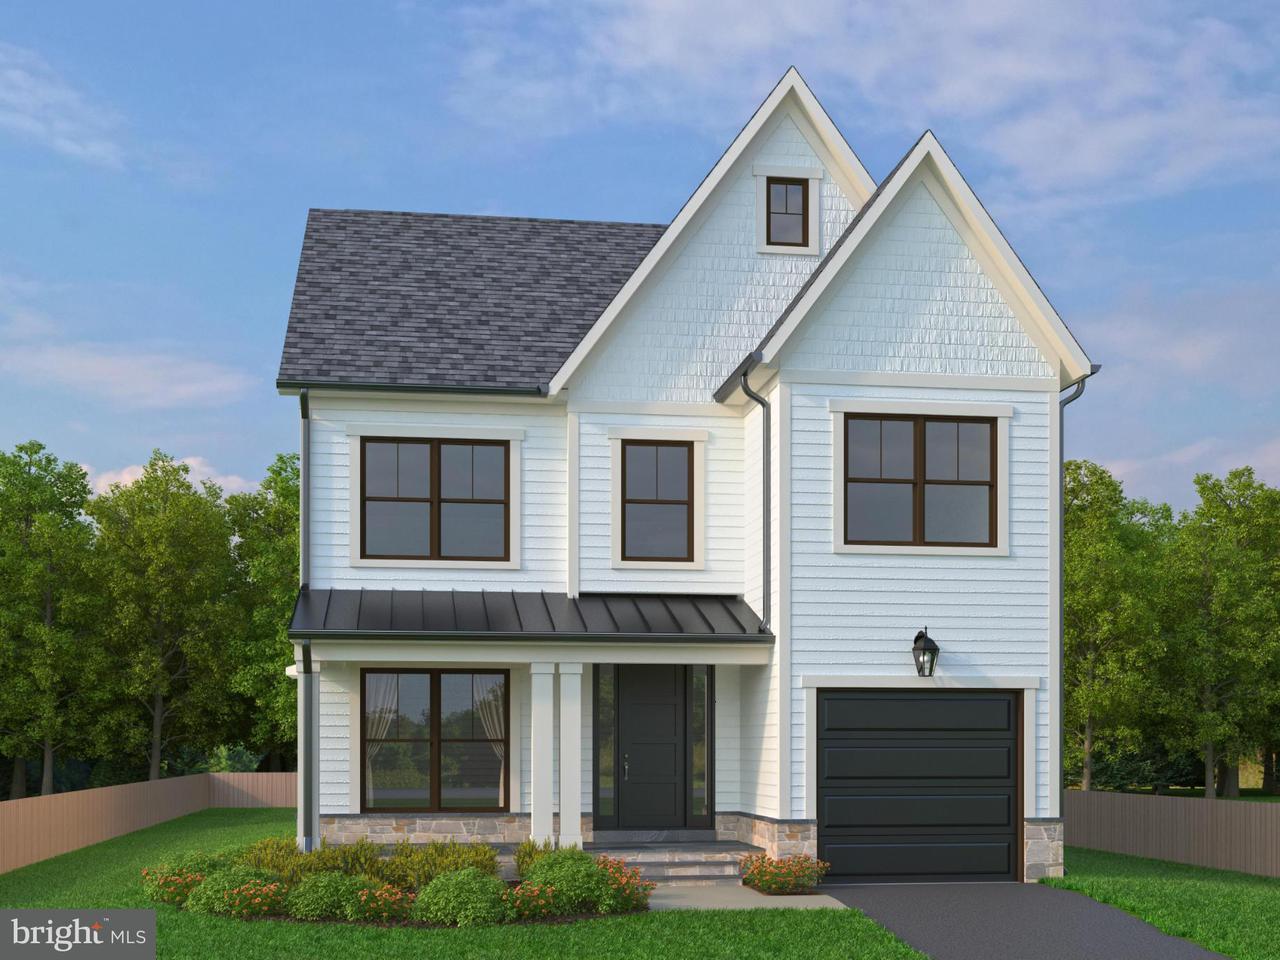 Single Family Home for Sale at 910 N DANVILLE 910 N DANVILLE Arlington, Virginia 22201 United States